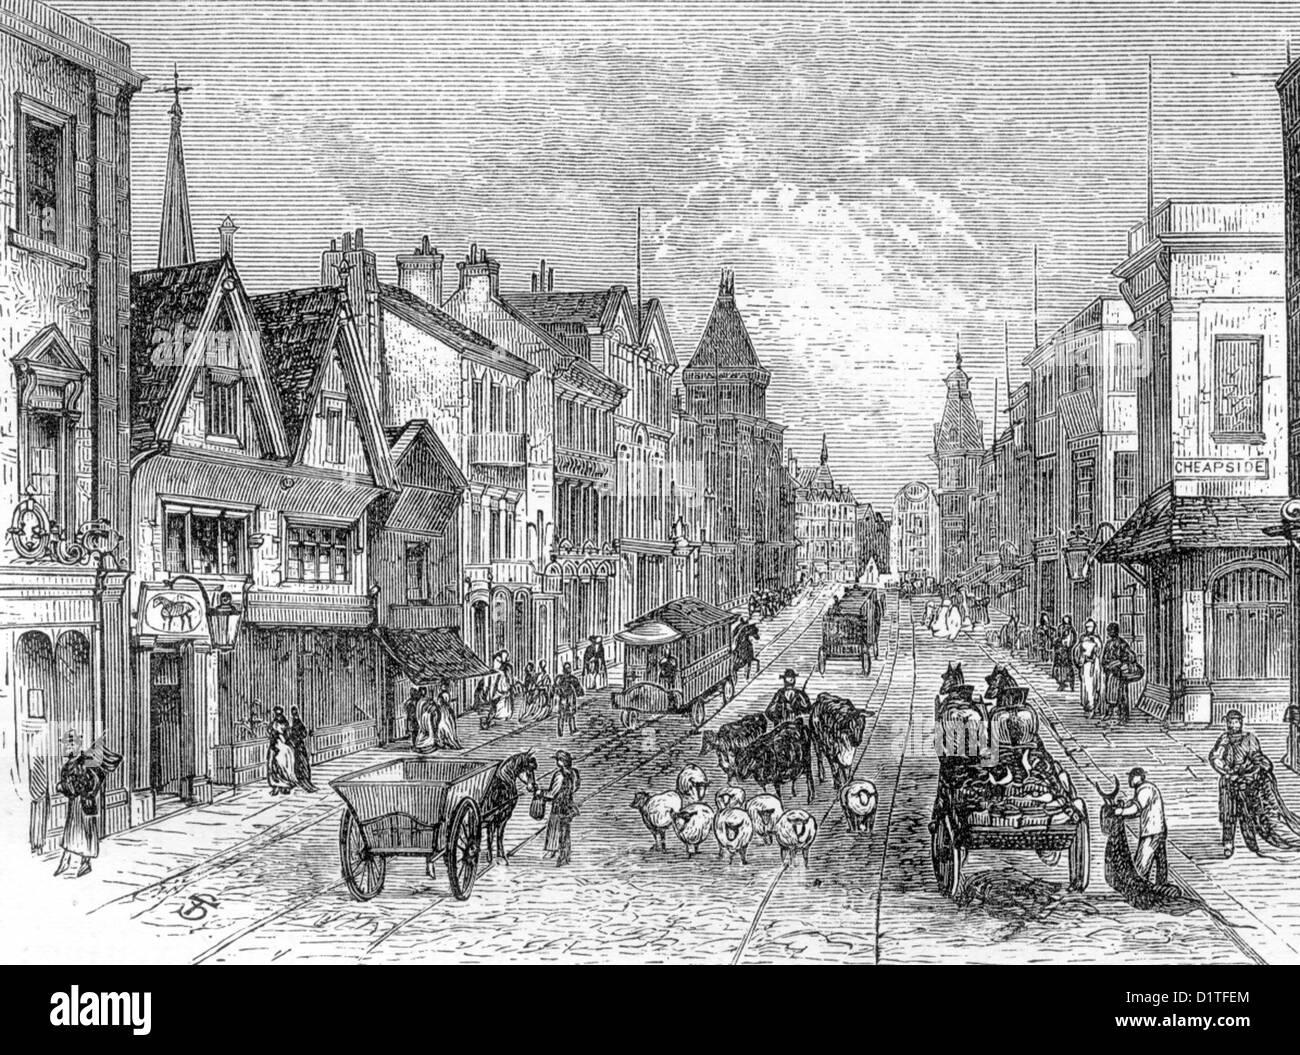 Briggate, Leeds, Yokshire; Looking North; Late 19th Century Illustration - Stock Image